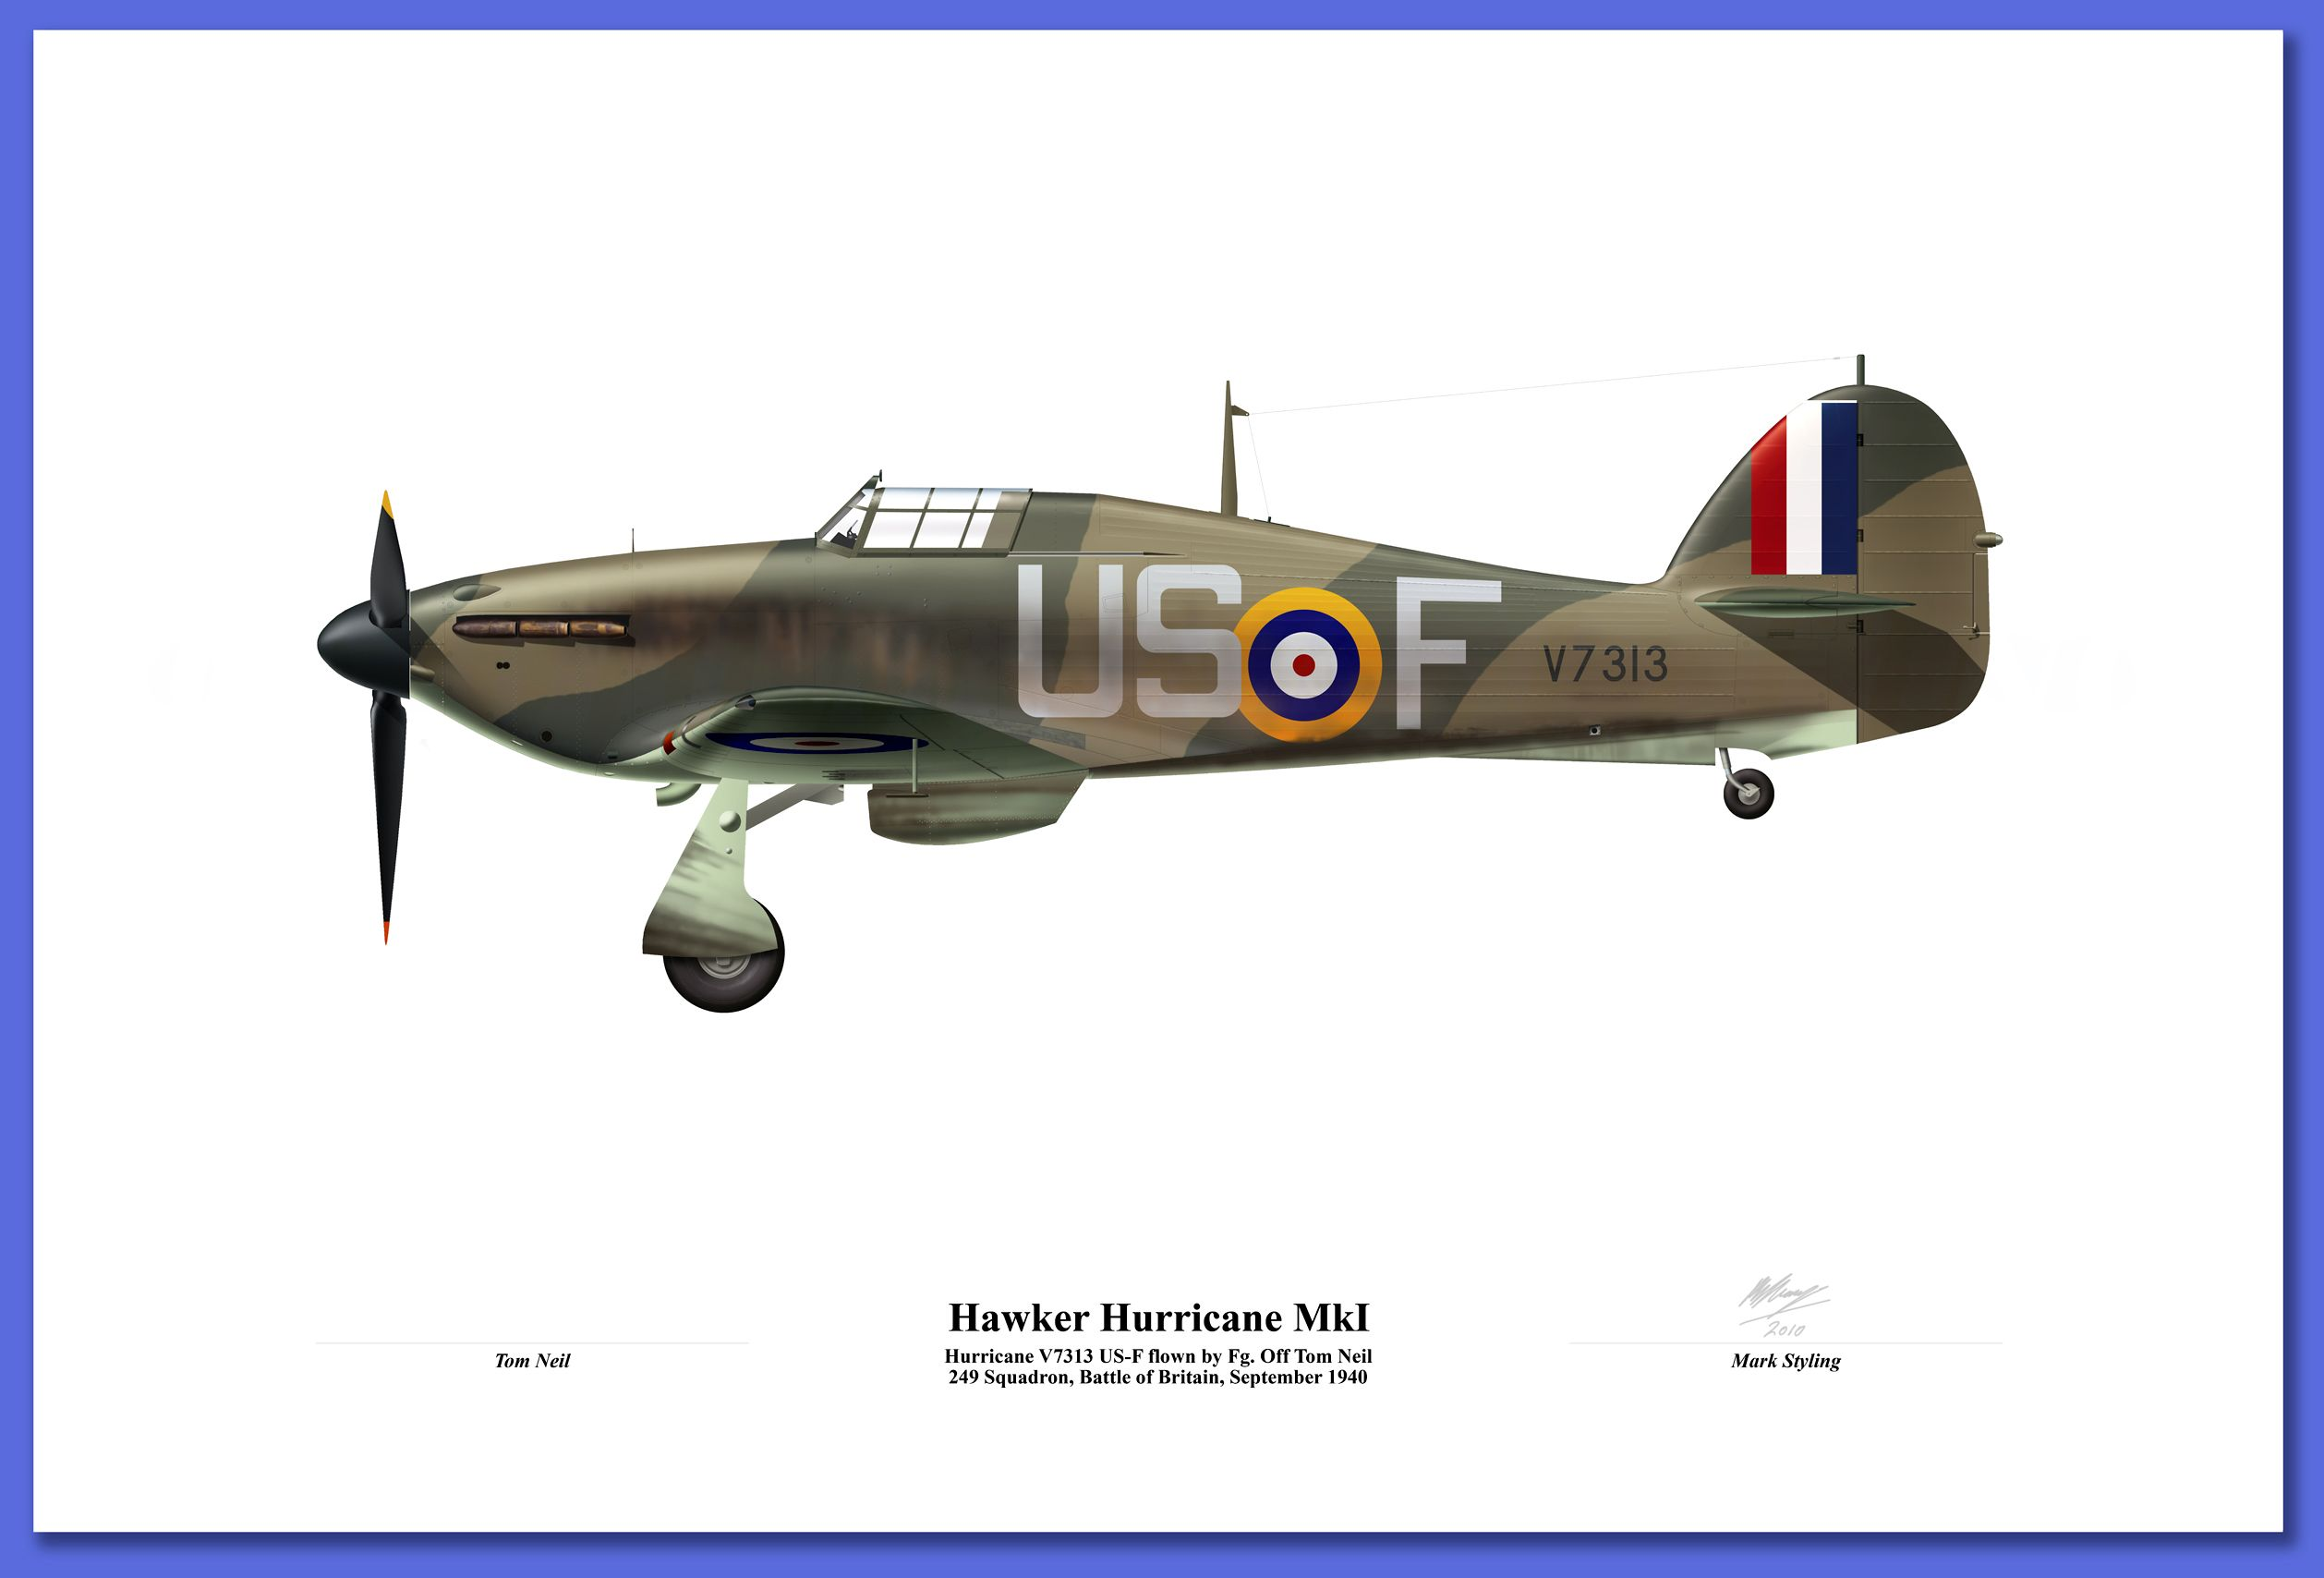 hawker hurricane mki 249sq battle of britain mark styling